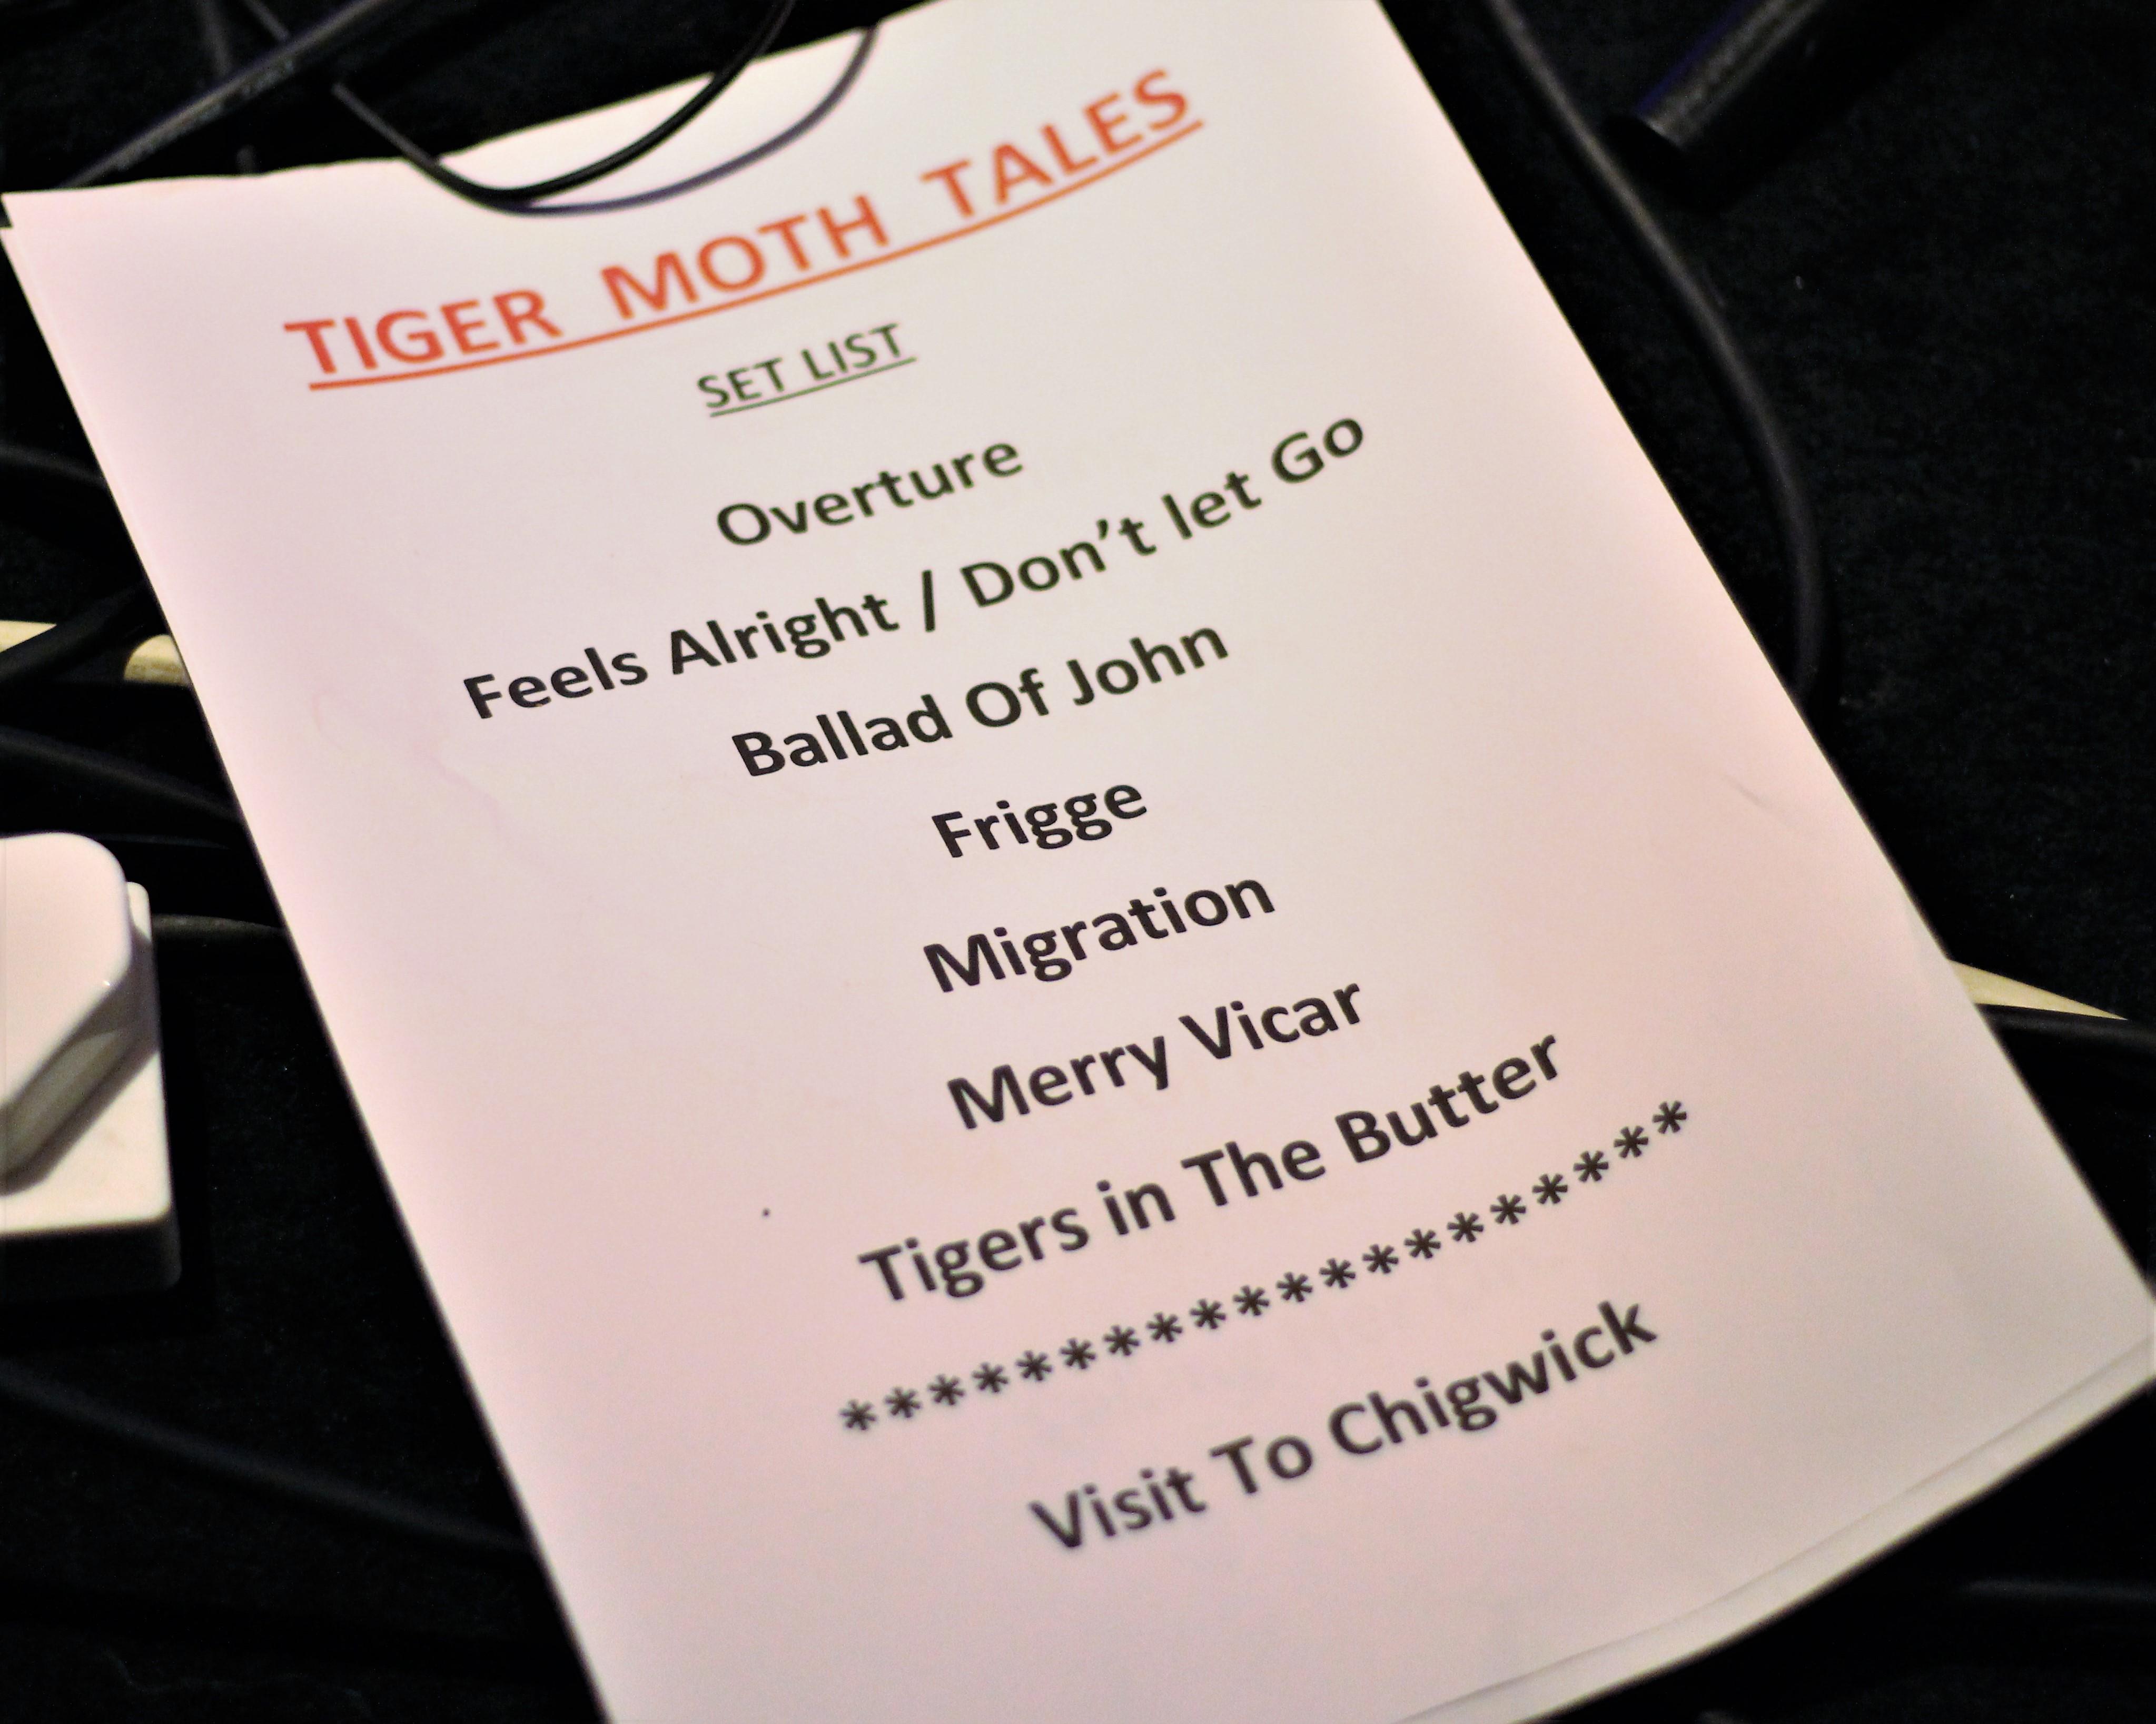 6 - Tiger Moth Tales _ Danfest 7 (1)